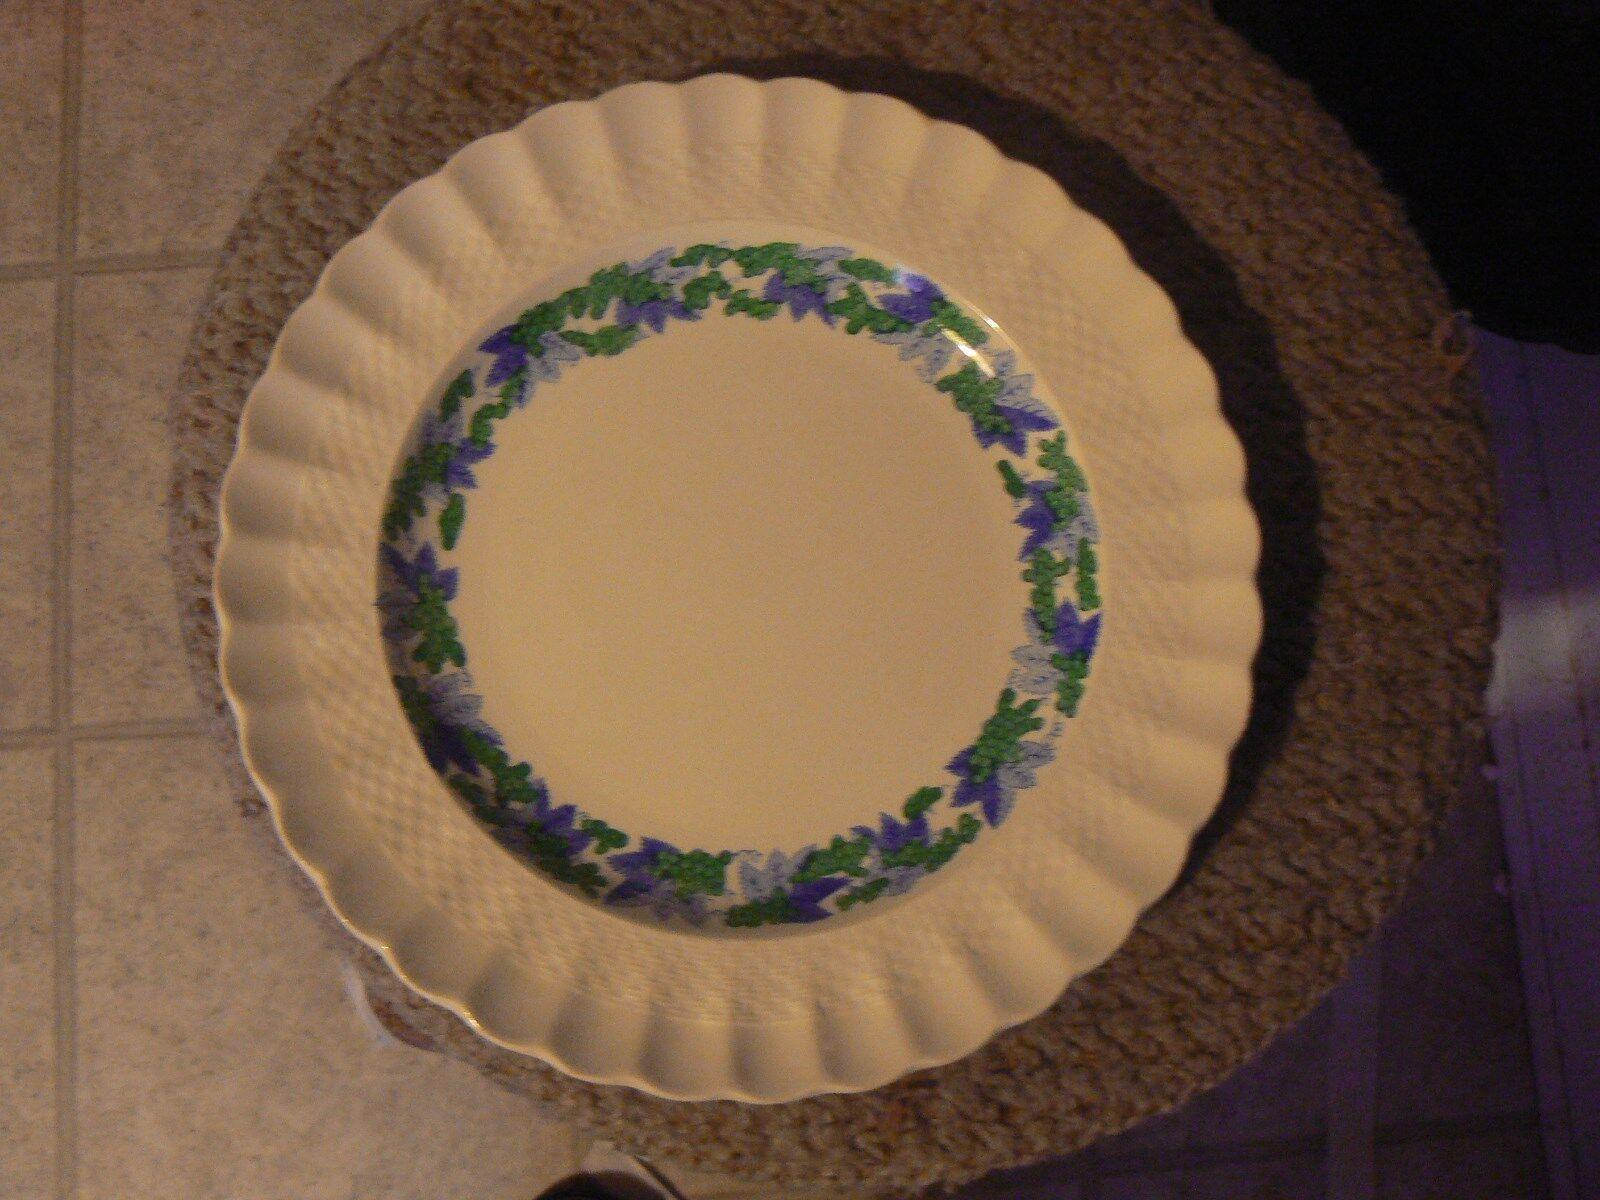 Copeland Valencia S1248 dinner plate 7 available